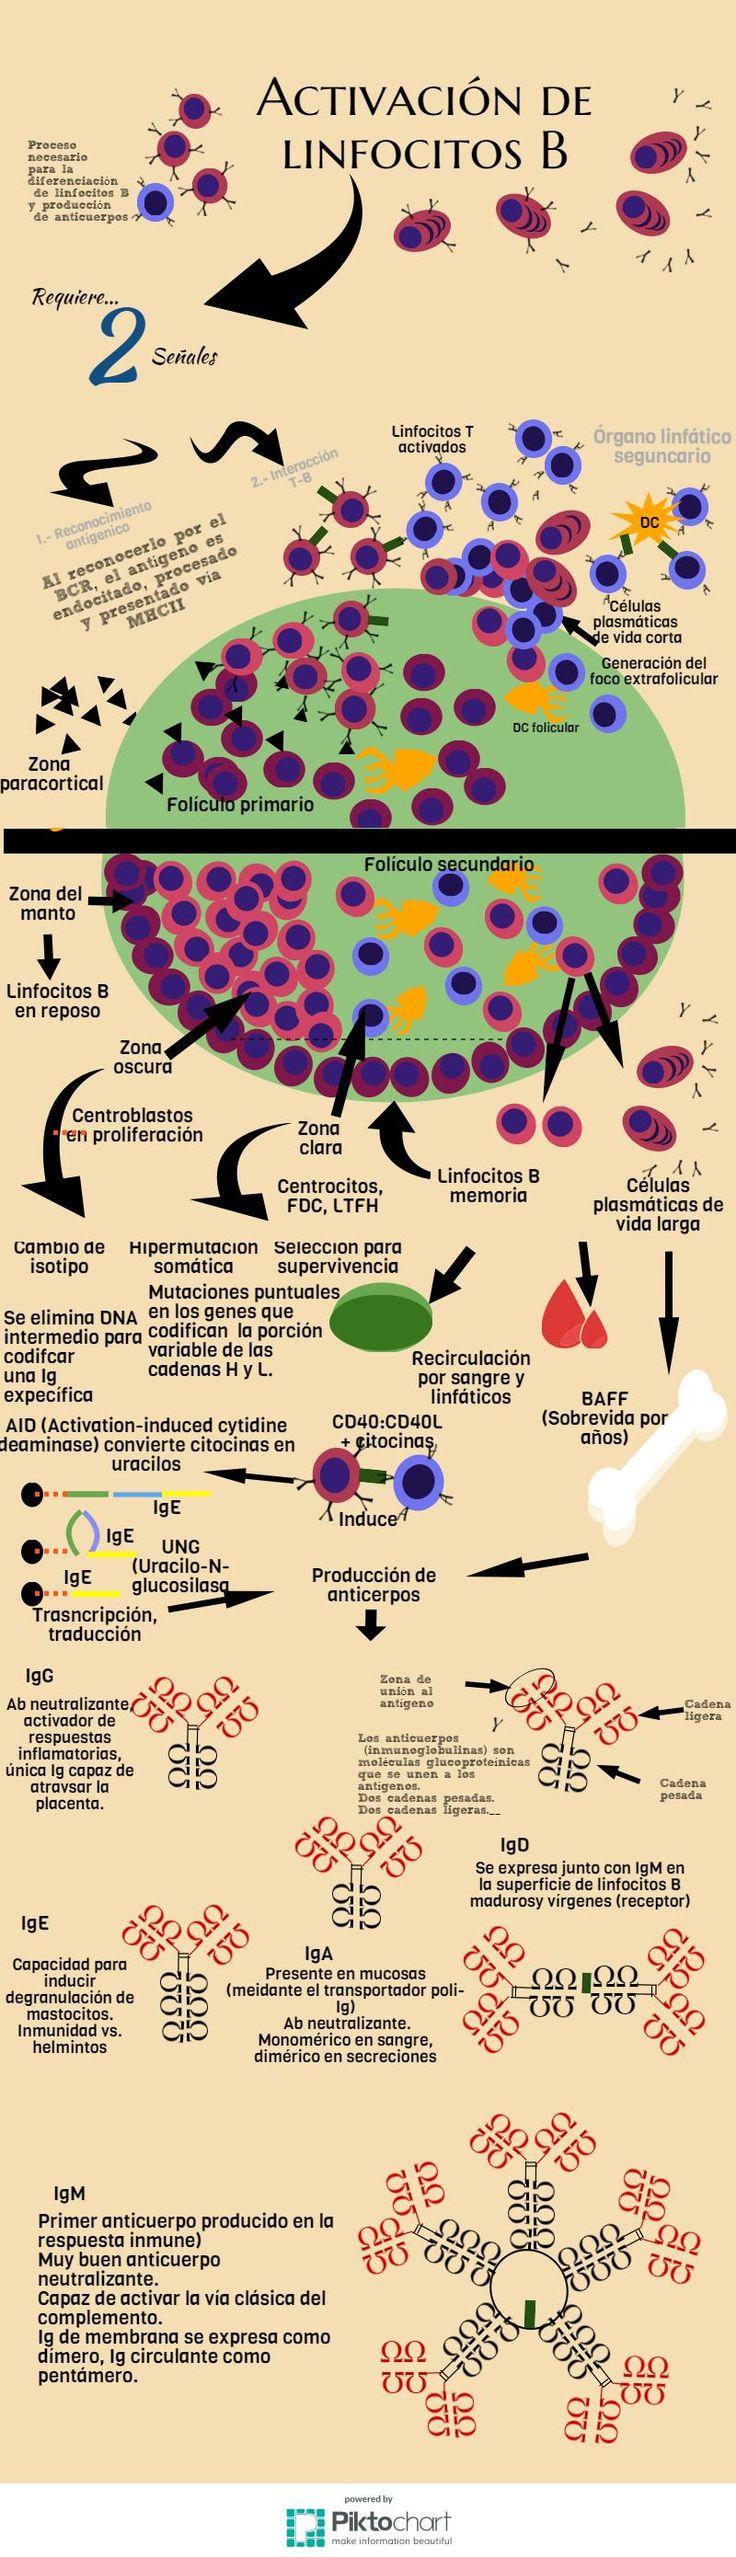 Activacion de linfocitos B